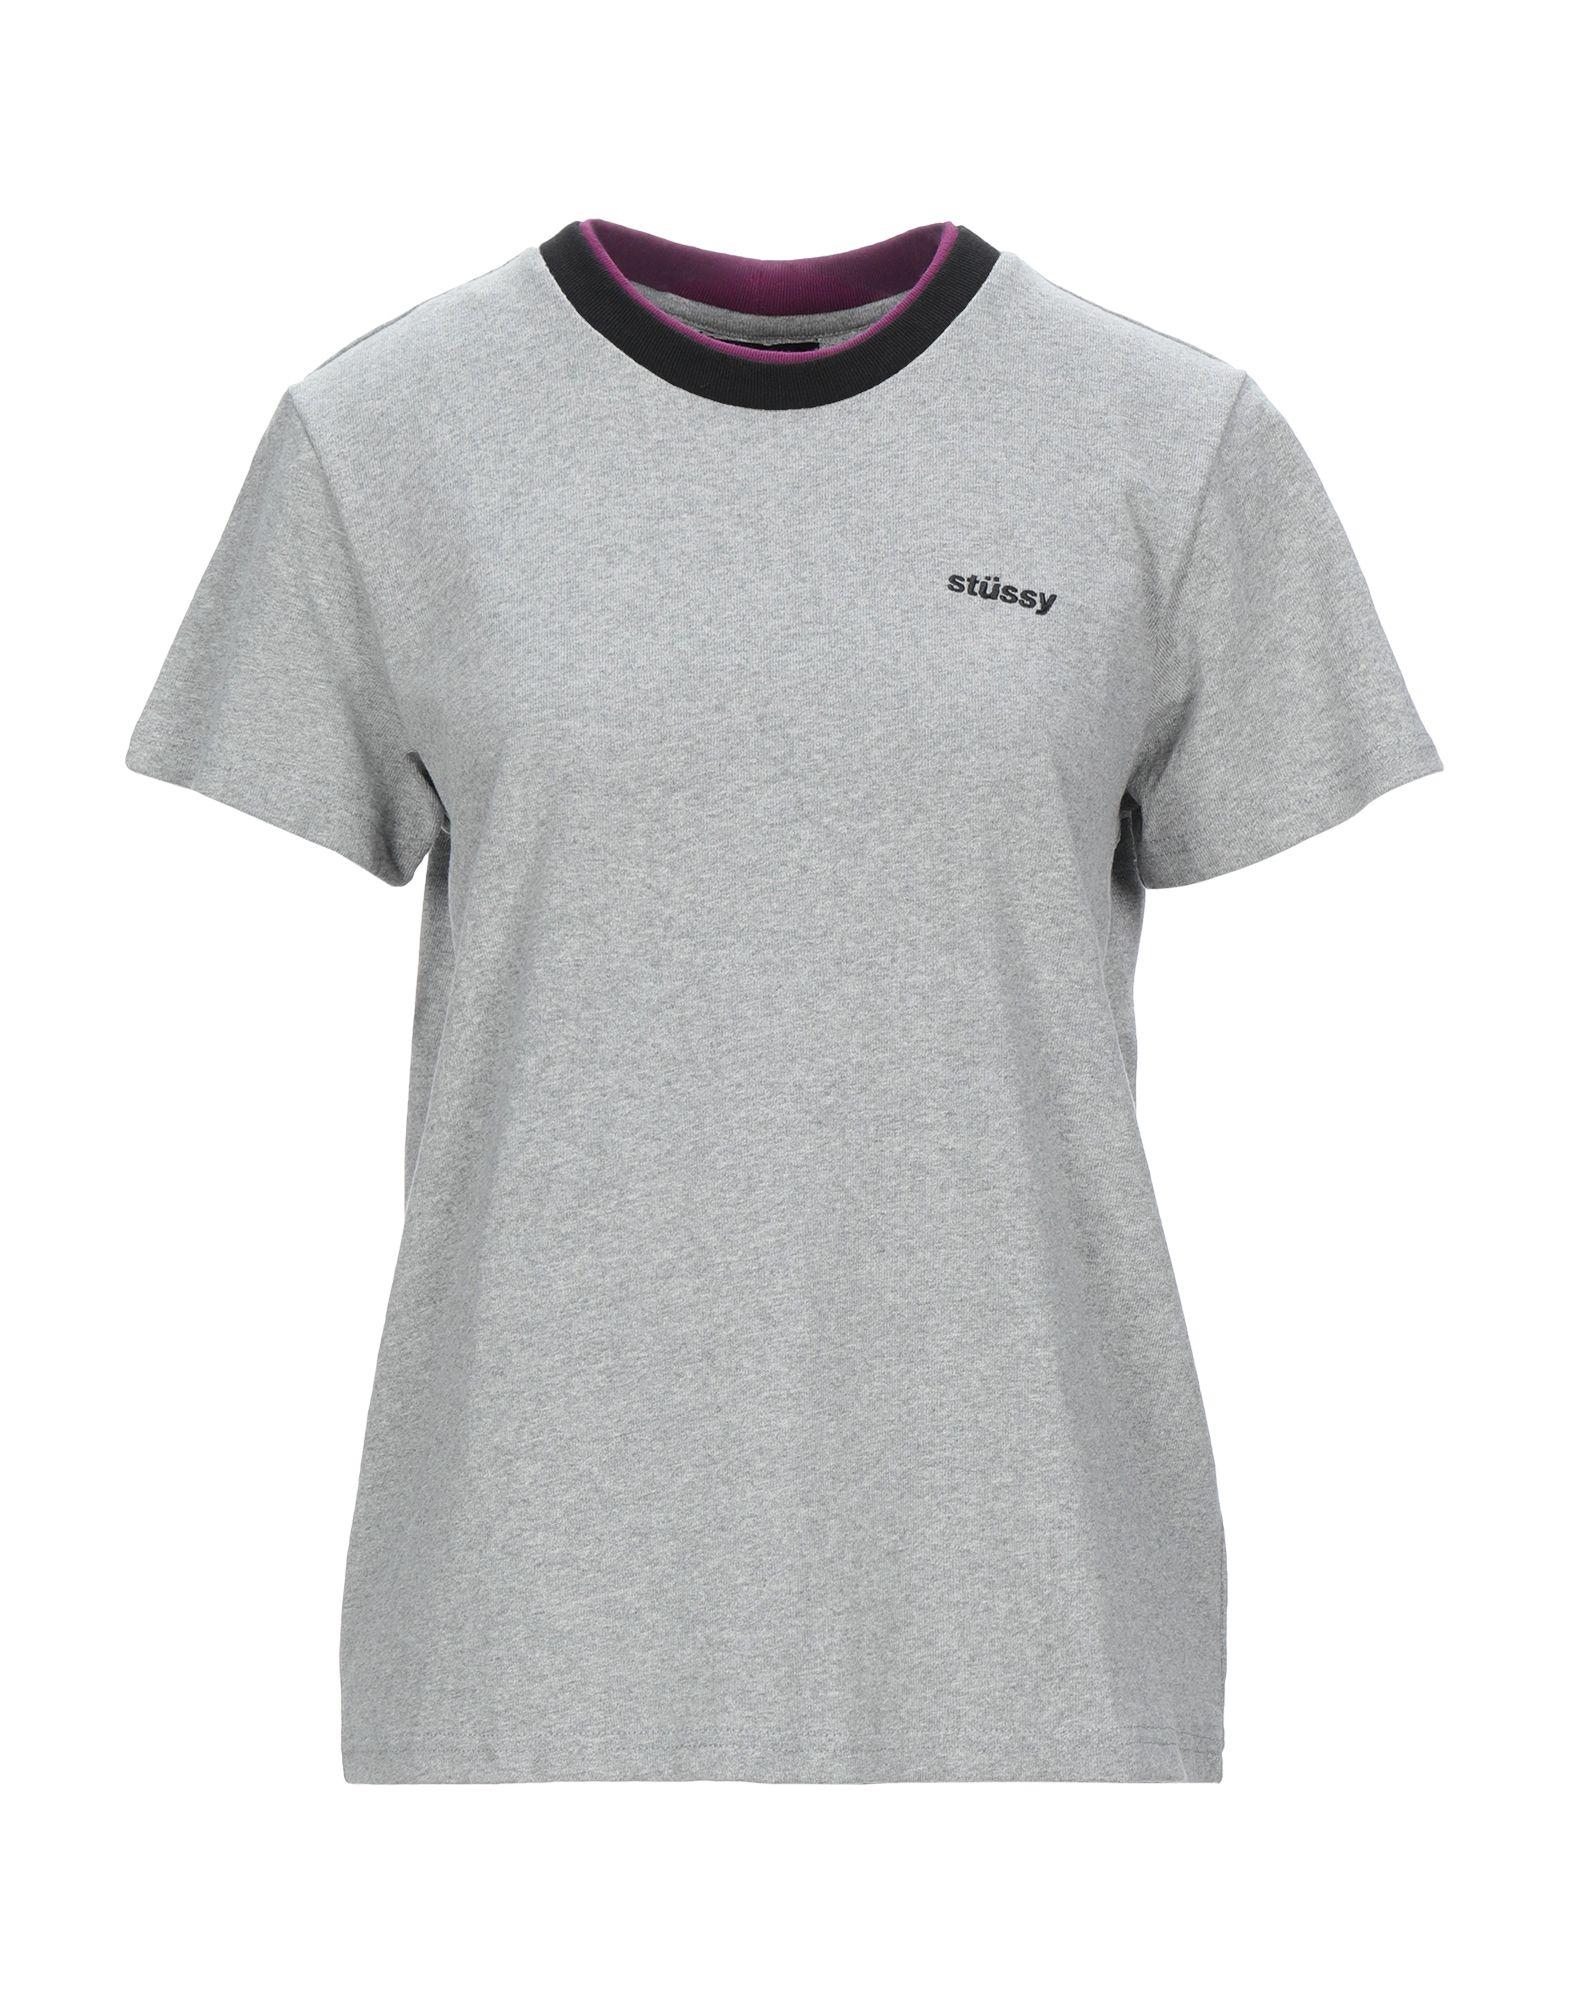 STUSSY Футболка футболка stussy basic stussy tee женская white l